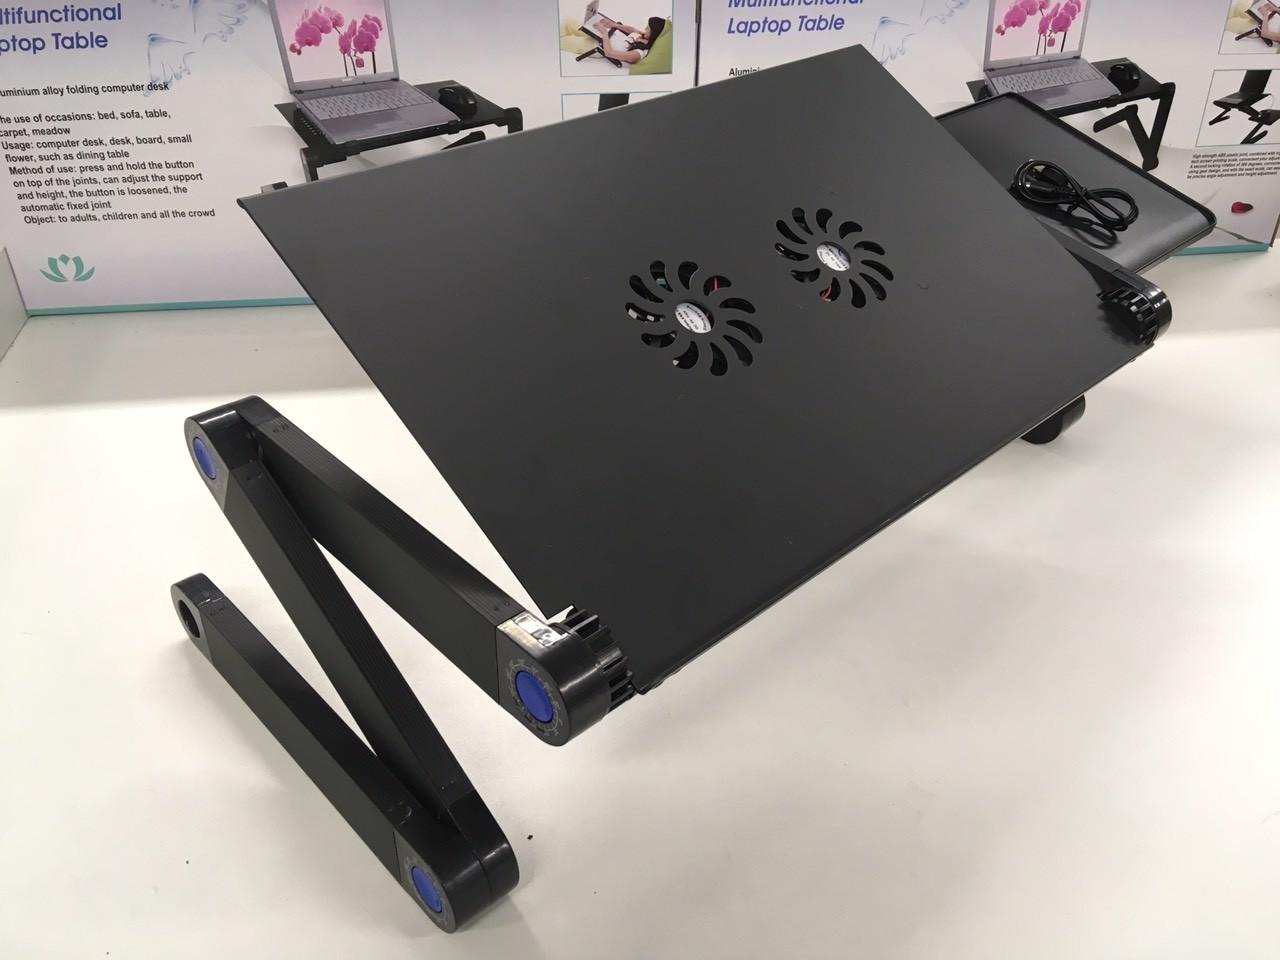 Подставка Laptop Table Multifunctional Laptop Table ART-A9 (10 шт)